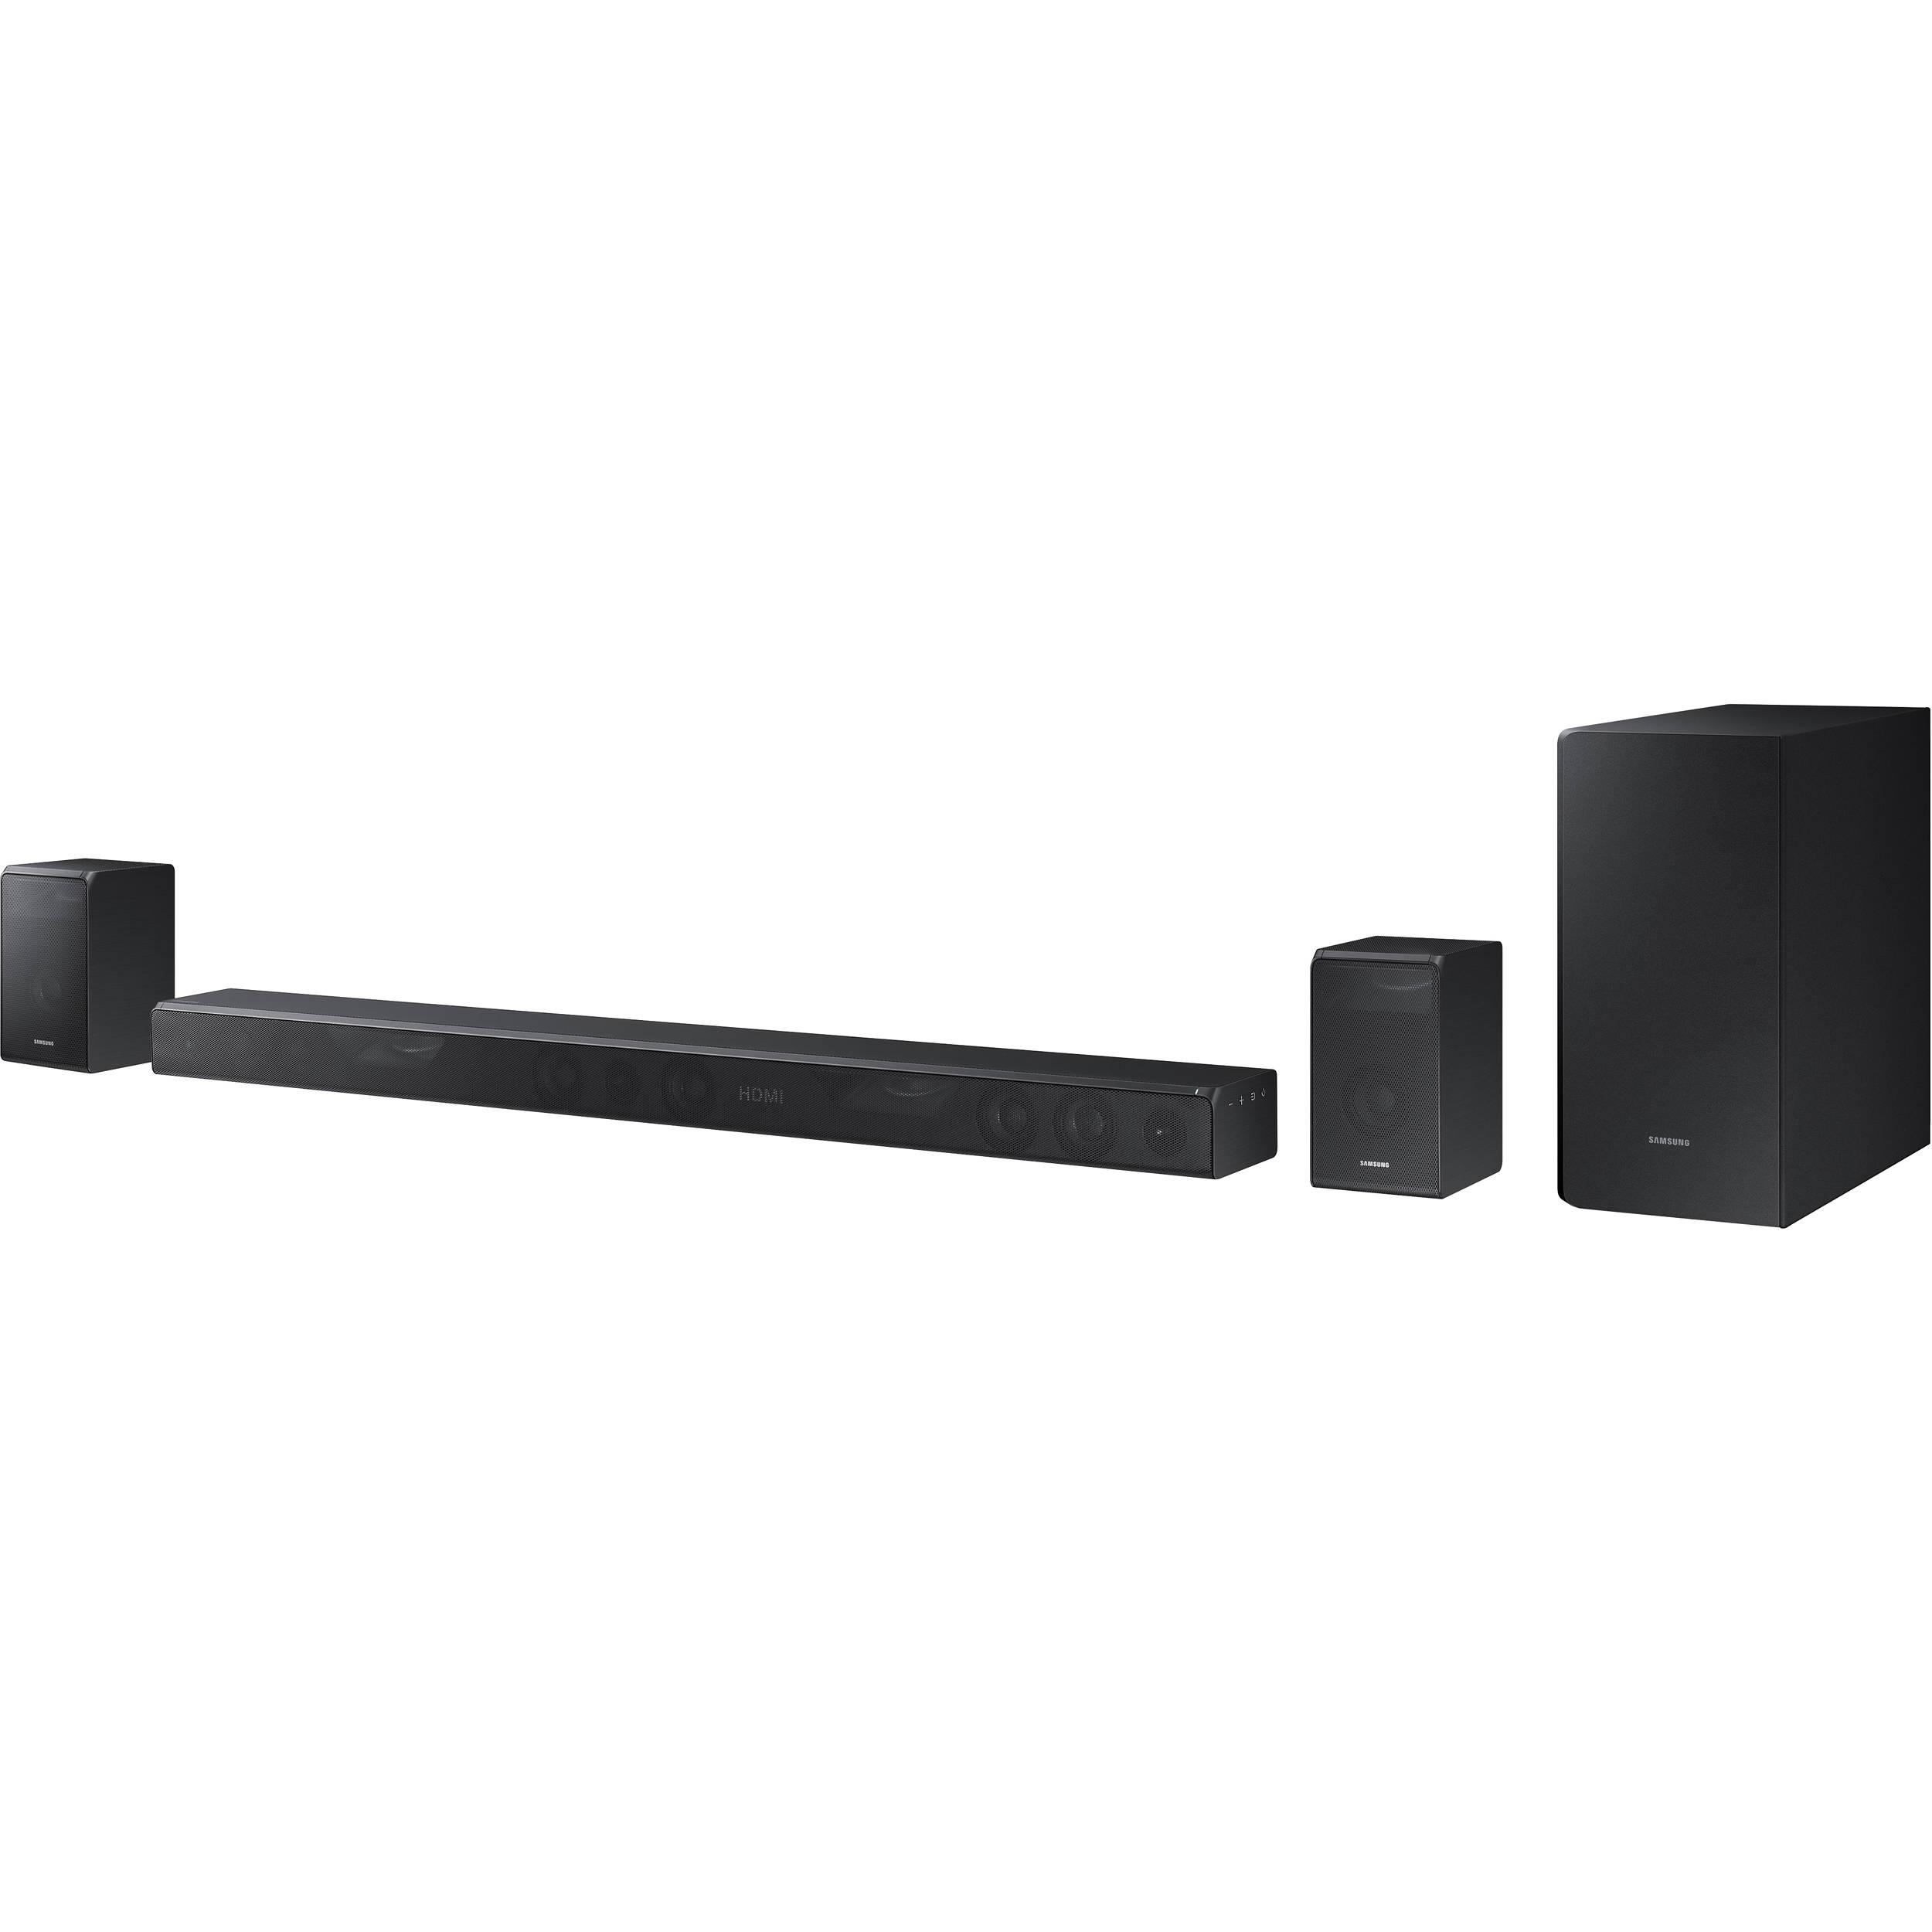 samsung soundbar hw km45c manual